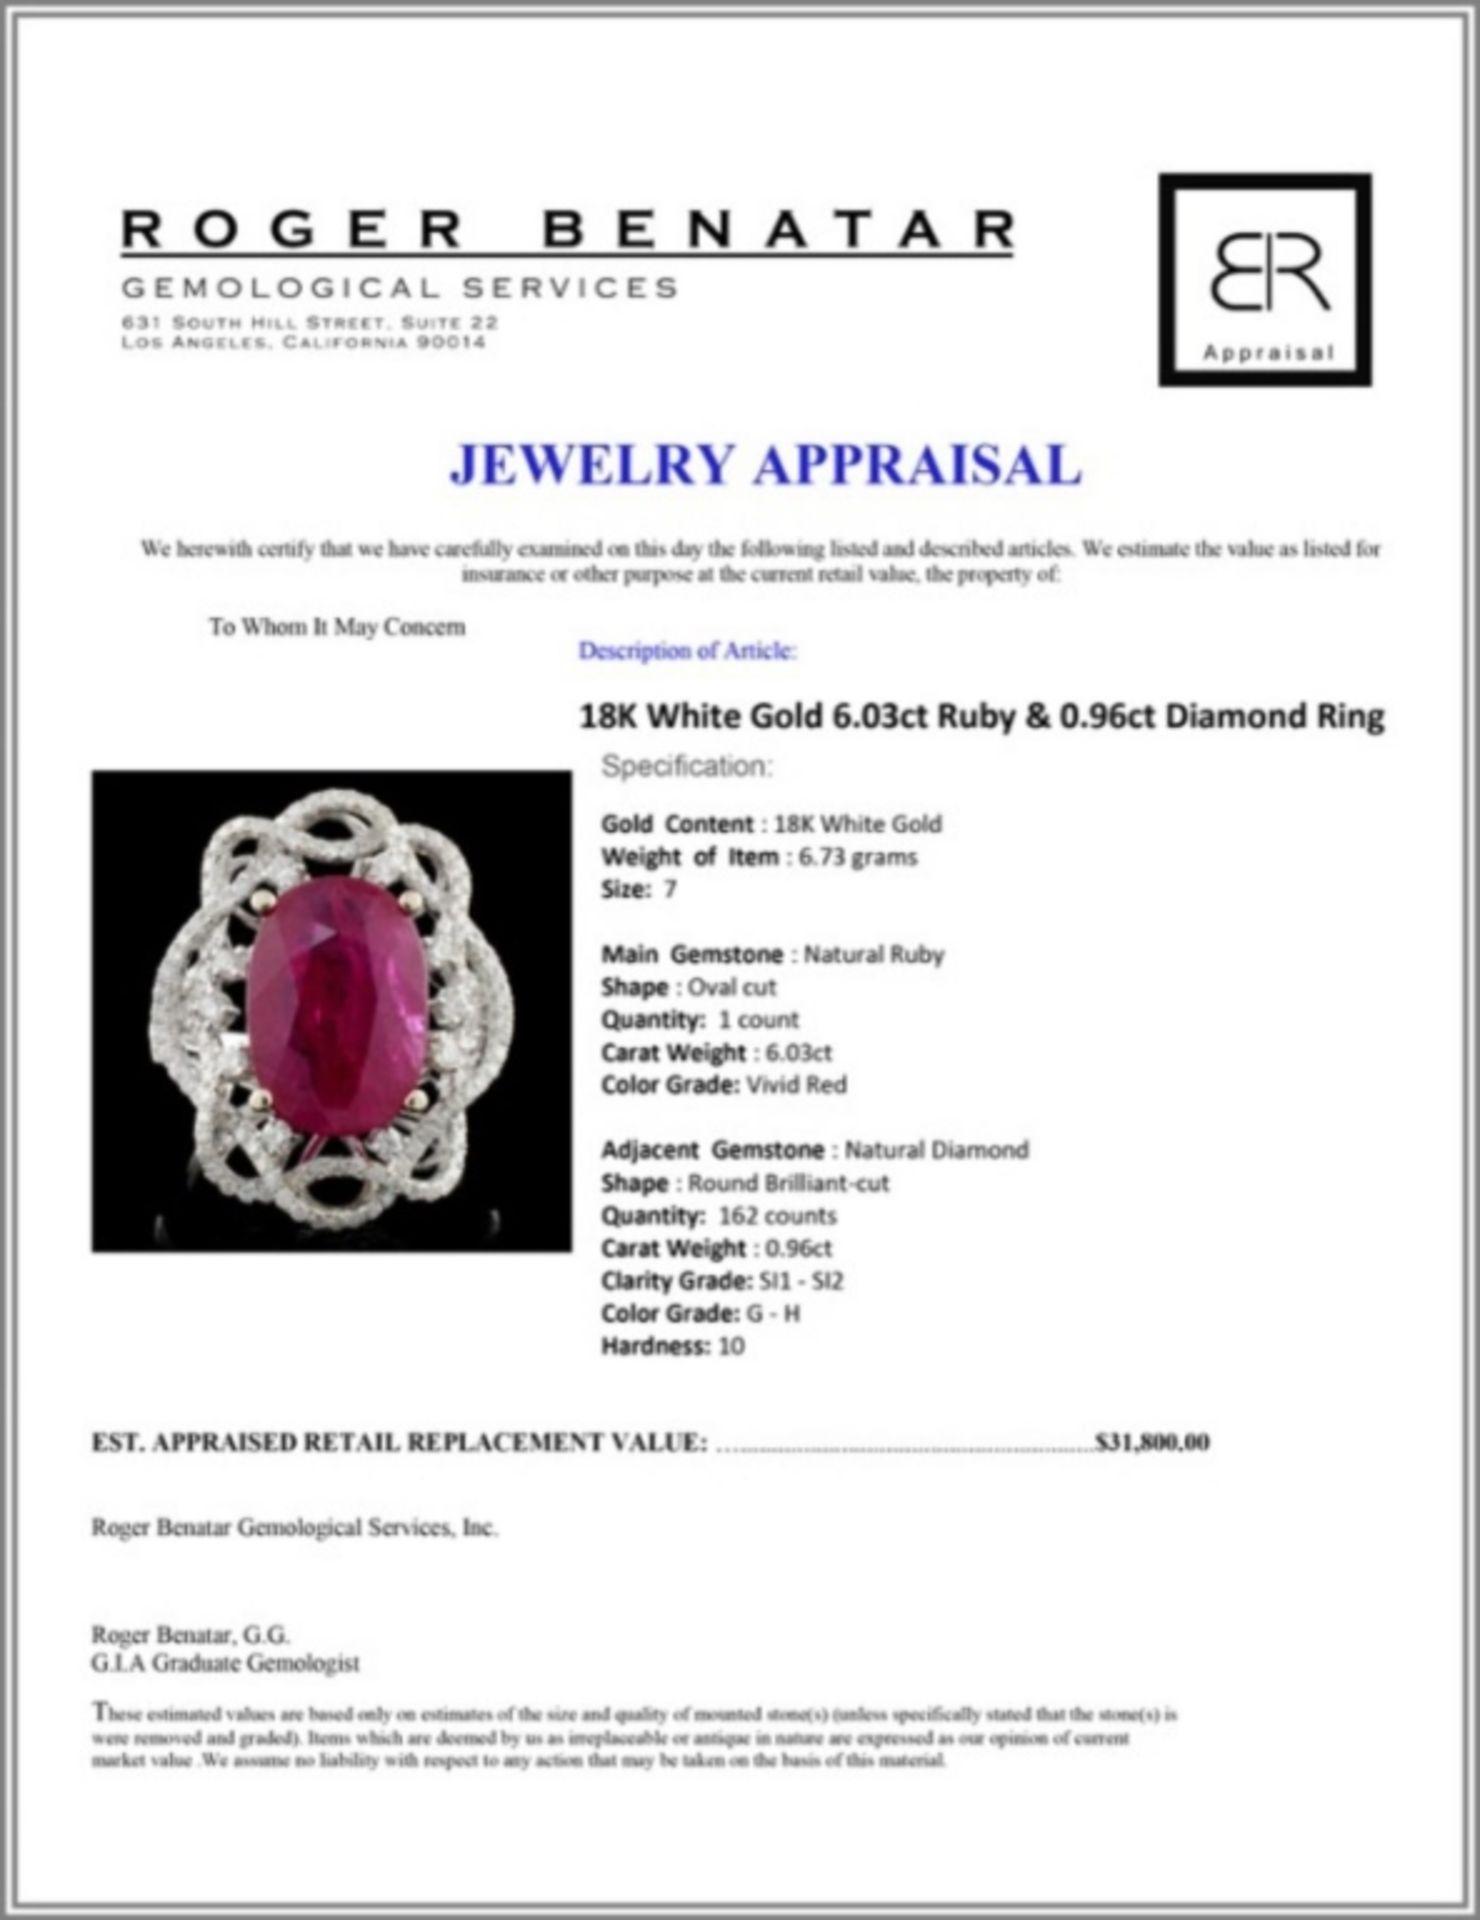 18K White Gold 6.03ct Ruby & 0.96ct Diamond Ring - Image 4 of 4